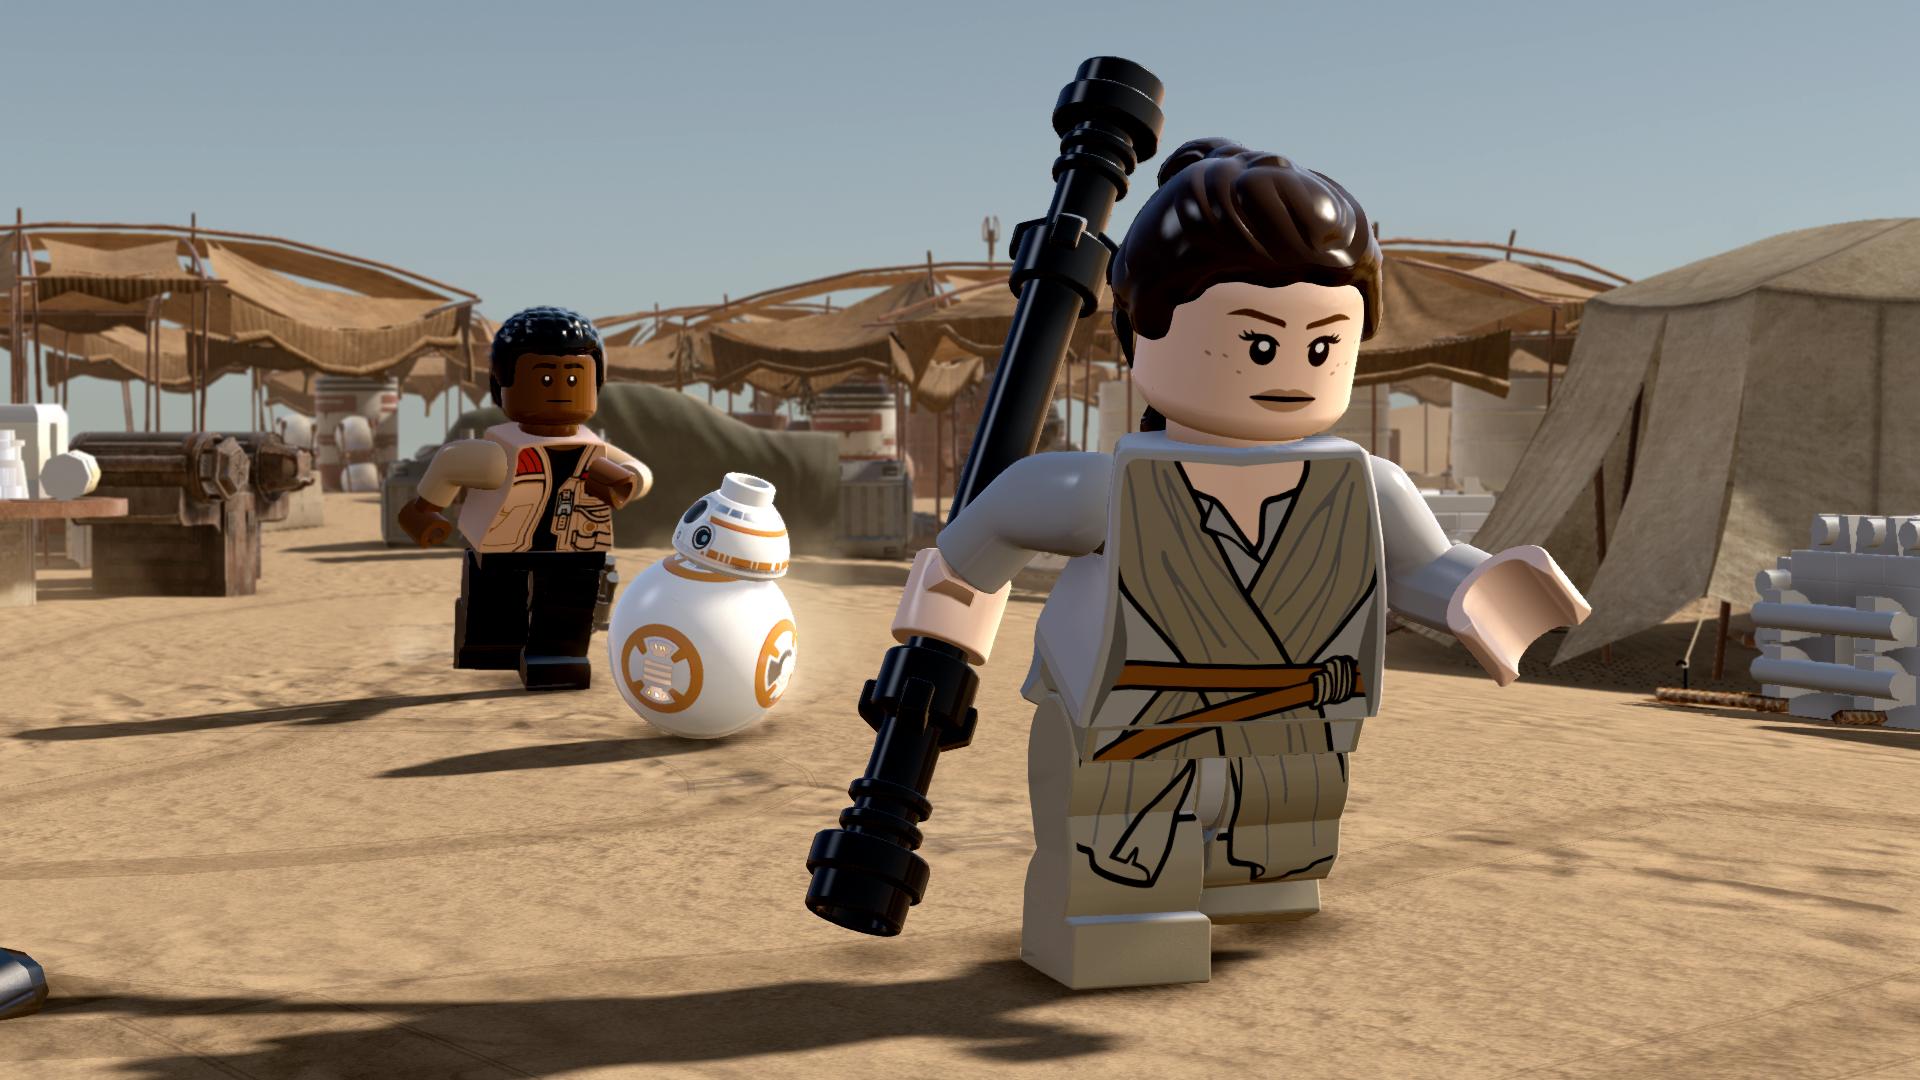 Lego Star Wars The Force Awakens Review Gamesradar